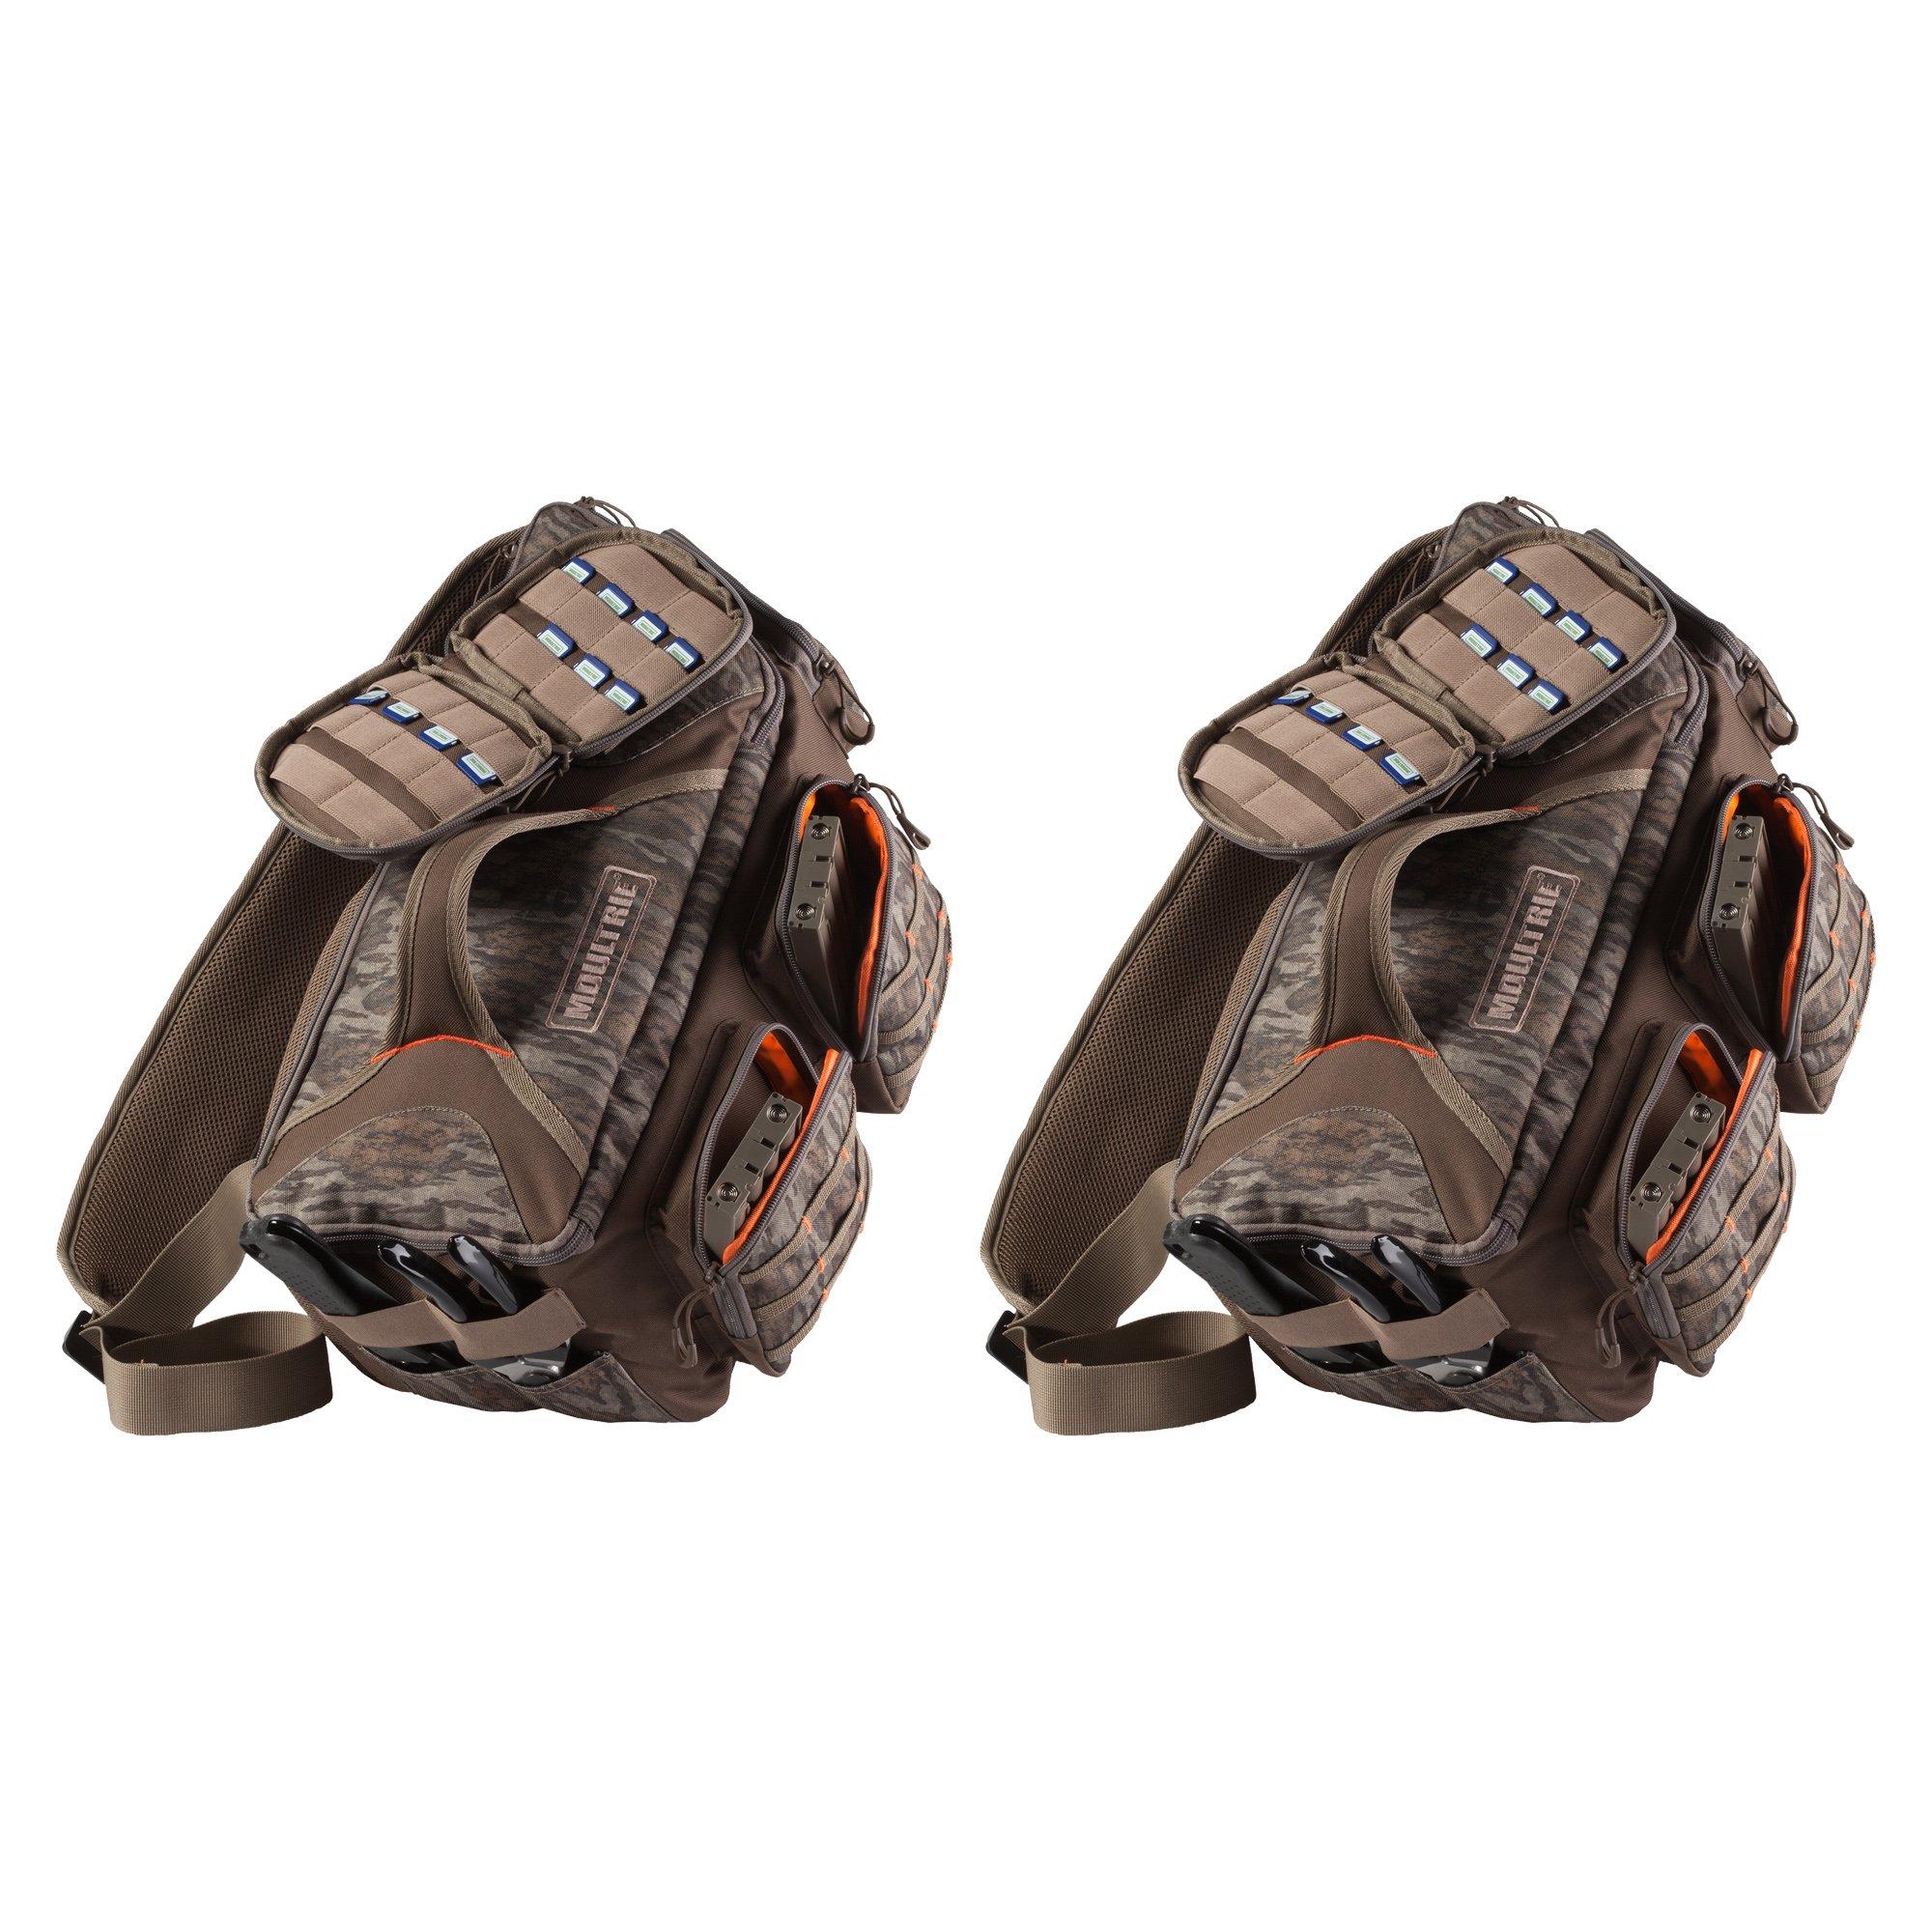 Moultrie Game Camera & Accessory Field Bag w/ Shoulder Strap, 2 Pack   MCA-13190